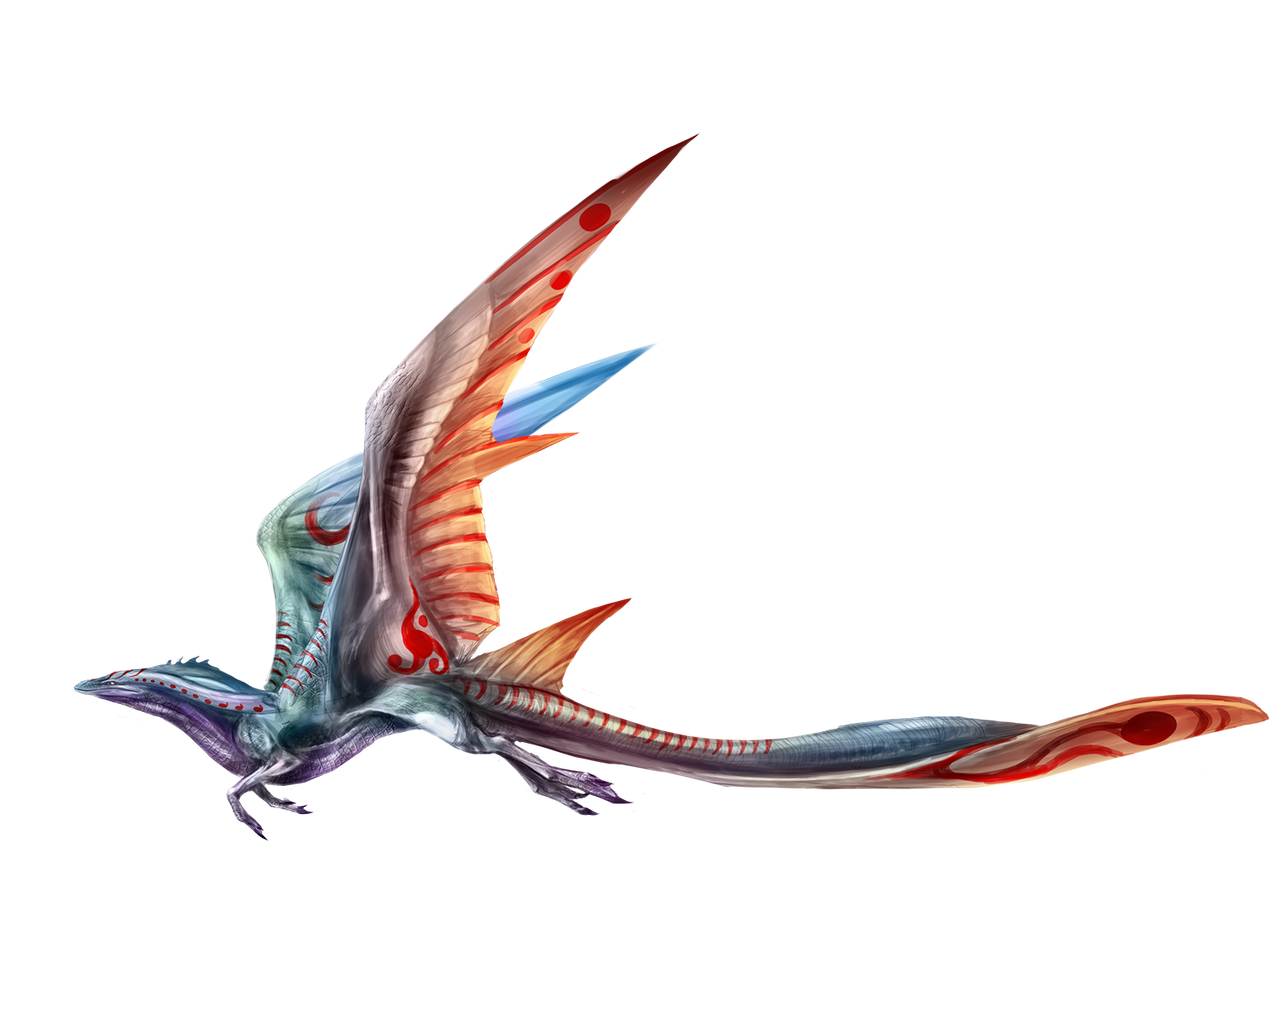 Leviathan dragon by kokodriliscus